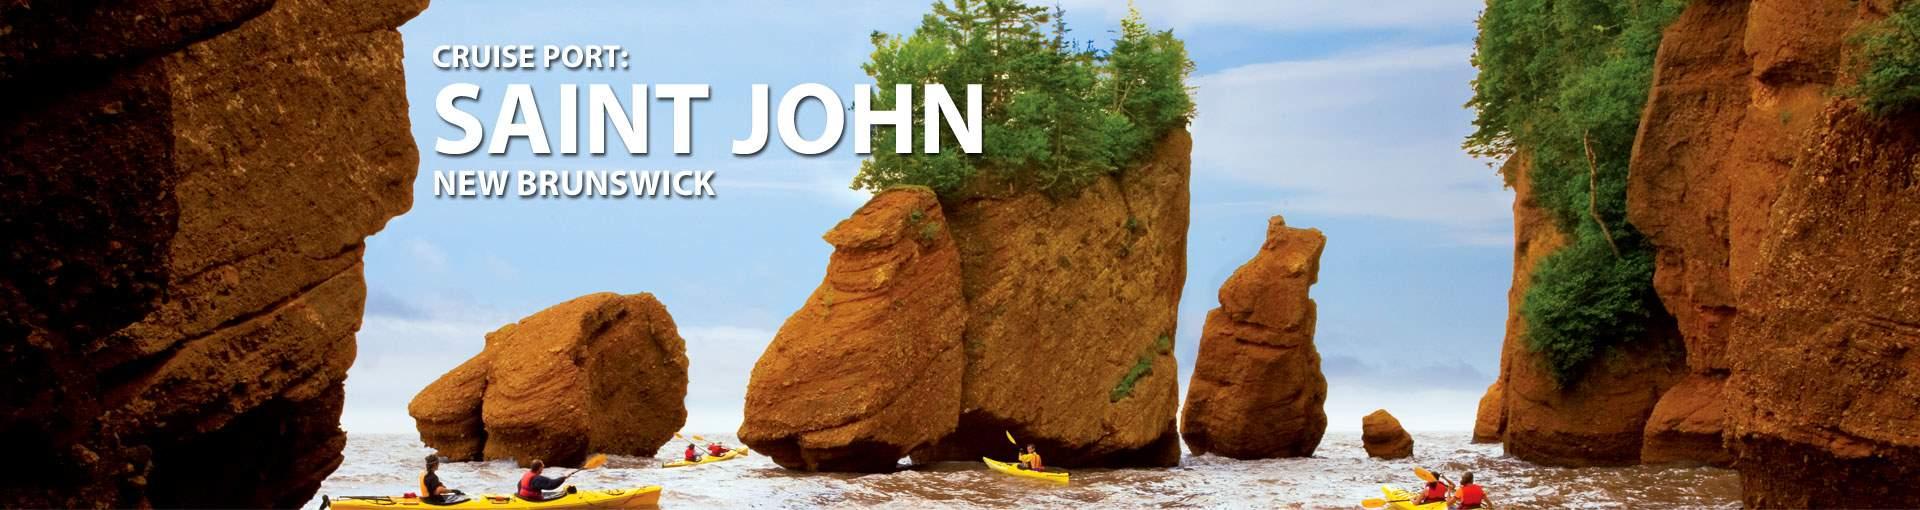 Cruises to Saint John, New Brunswick